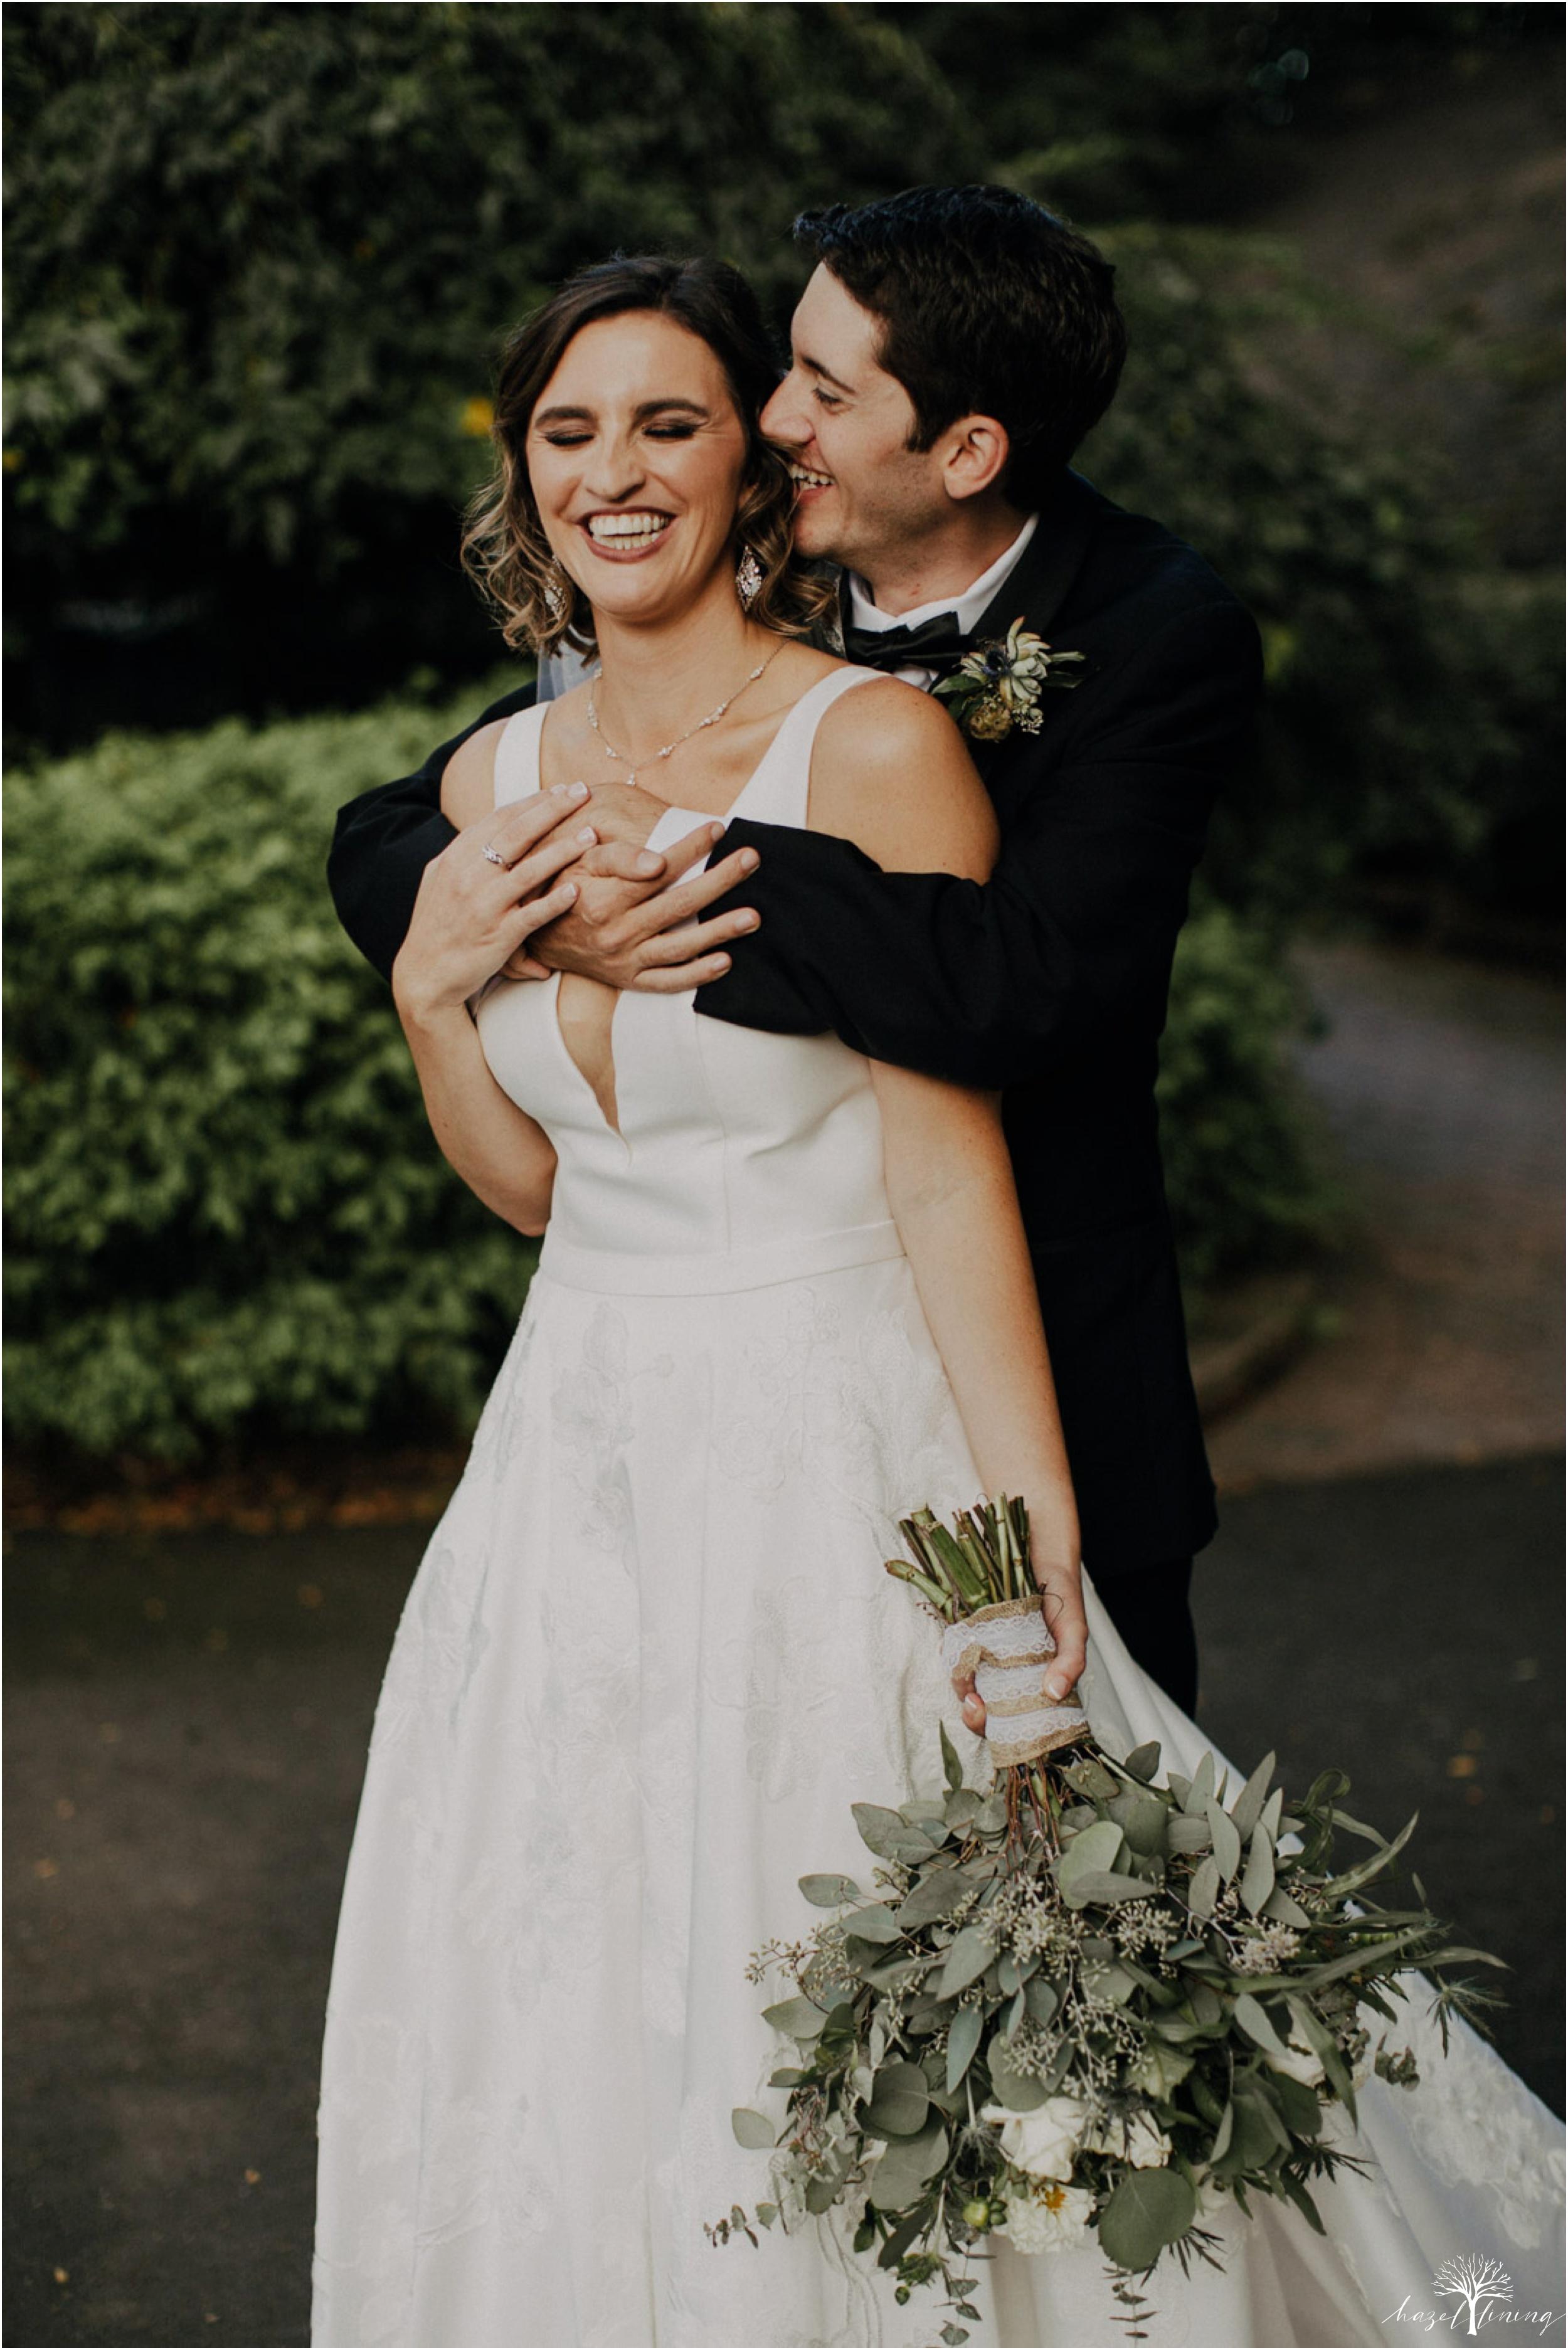 maureen-hepner-anthony-giordano-rose-bank-winery-newtow-pennsylvania-luxury-summer-wedding-hazel-lining-photography-destination-elopement-wedding-engagement-photography_0101.jpg